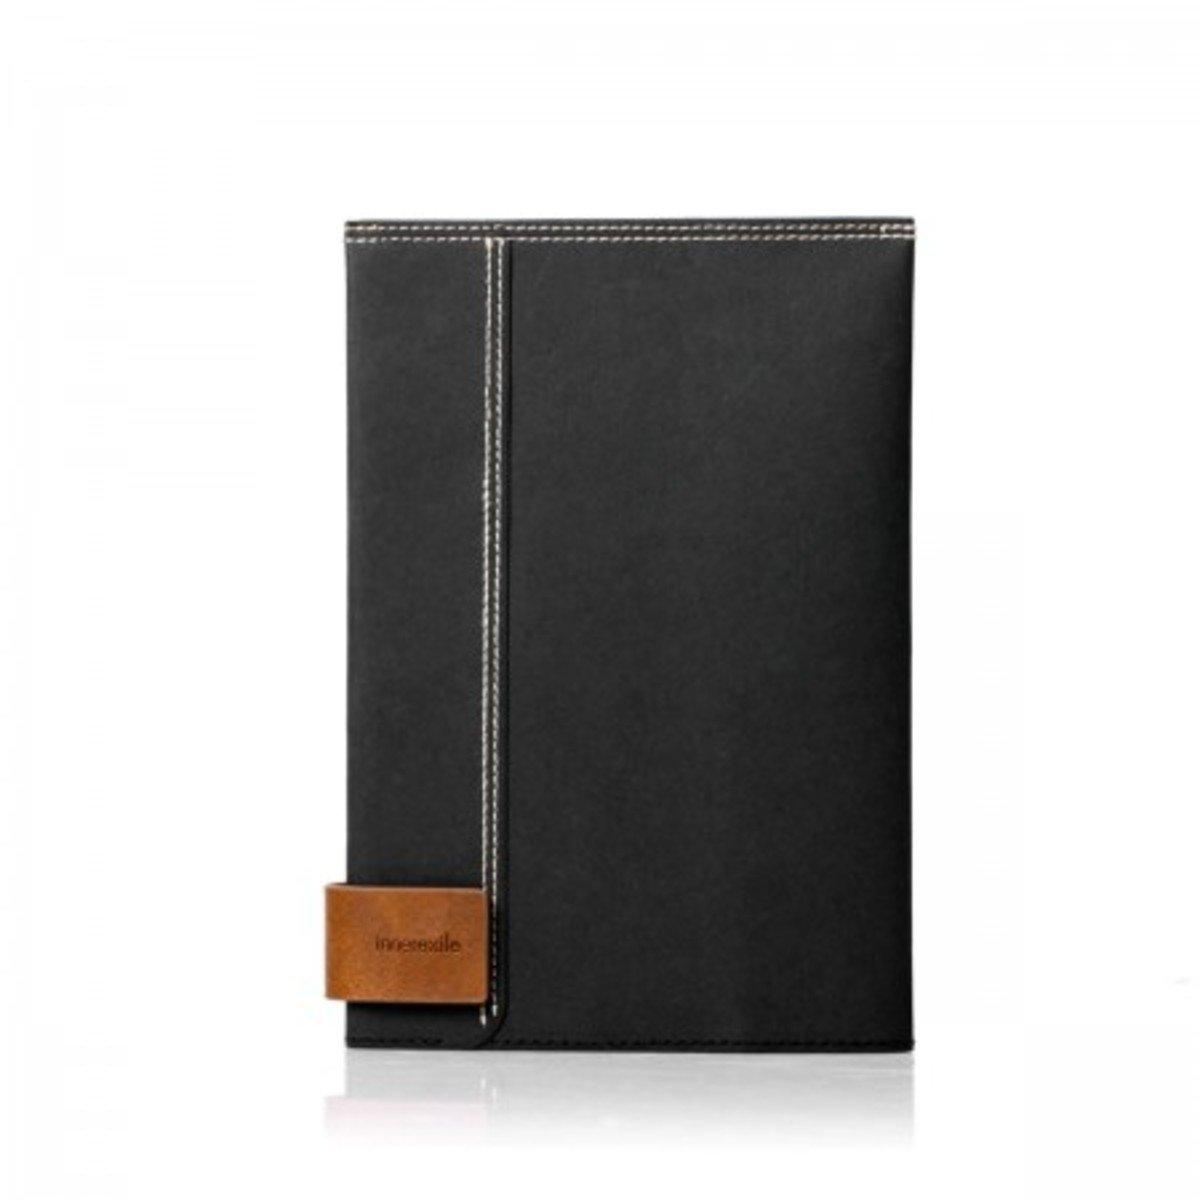 innerexile Pyramid 超纖柔軟Apple iPad Mini 立體收納包(黑)